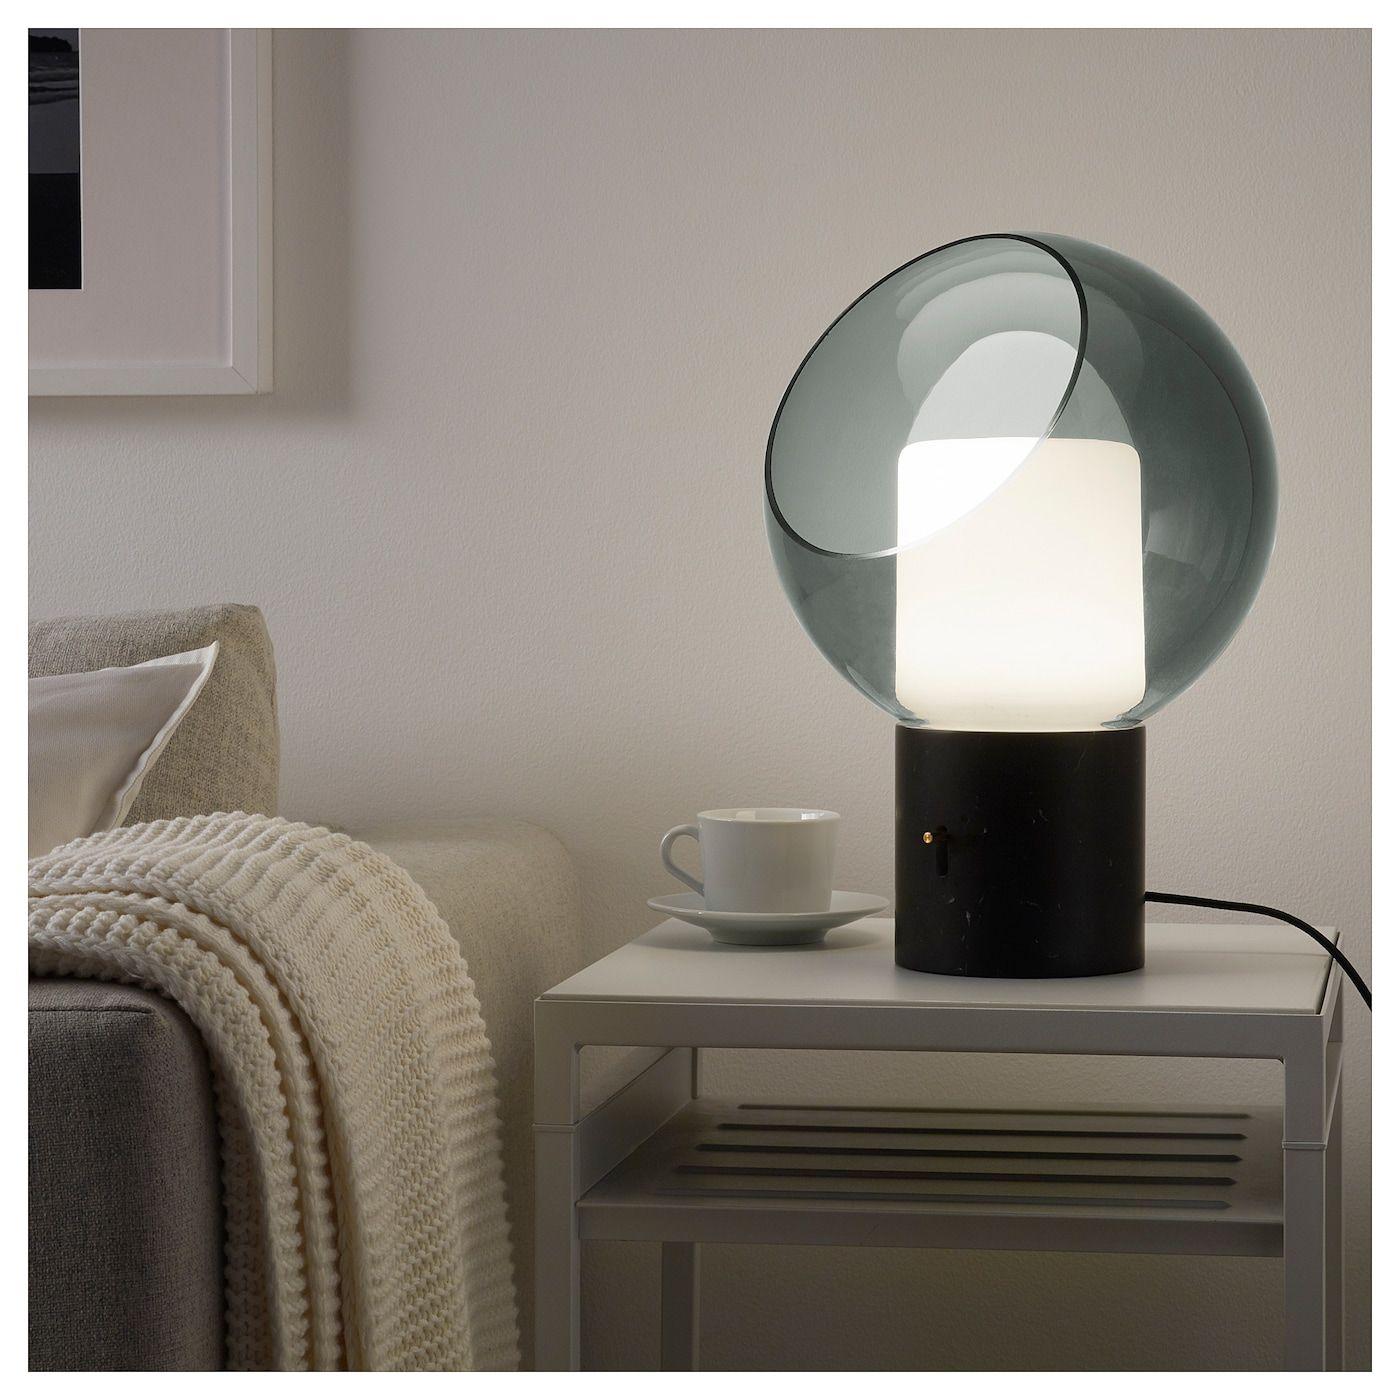 EVEDAL Bordslampa, marmor grå, grå klot IKEA | Bordslampa